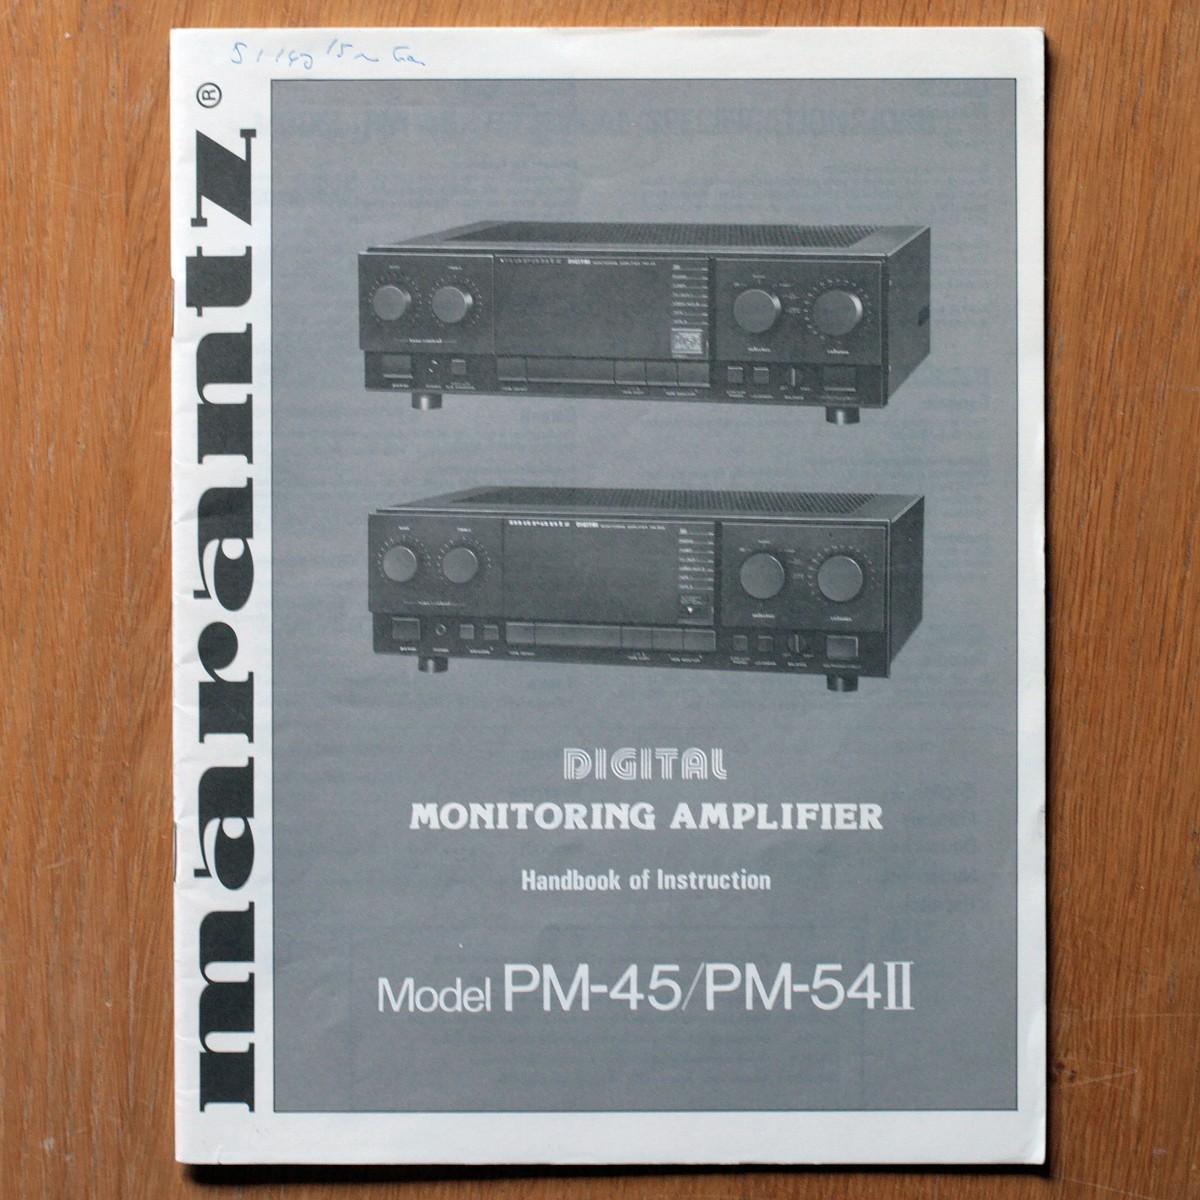 Marantz • Amplificateur • PM-45 & PM-54 II • Manuel utilisateur • User manual • Bedienungsanleitung • Manual de instrucciones • Instruzioni per l'uso